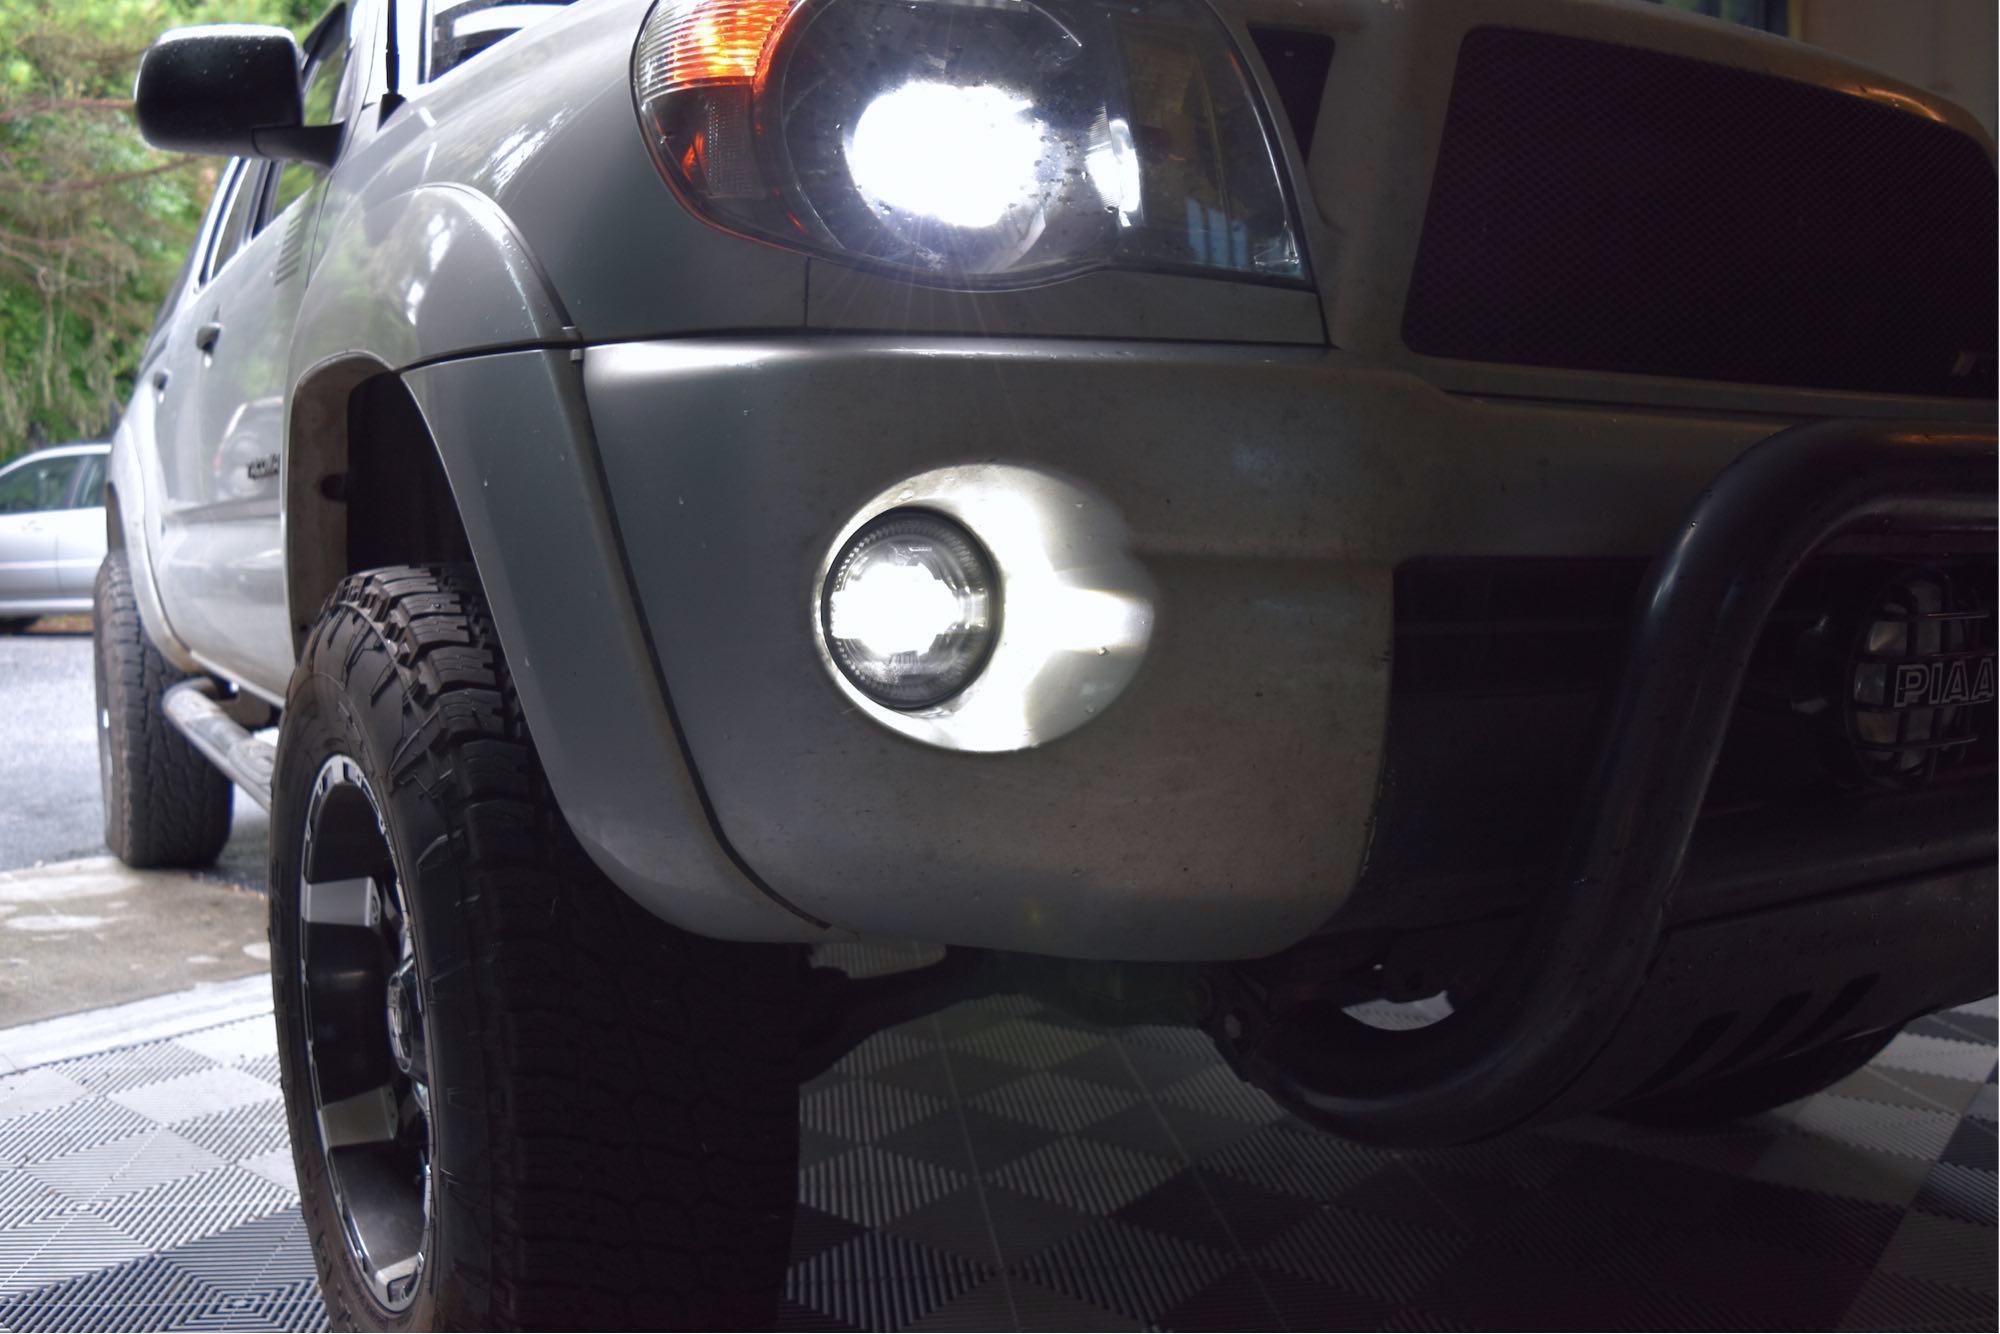 Morimoto Xb Led Fog Lights Toyota Round Winnipeg Hid